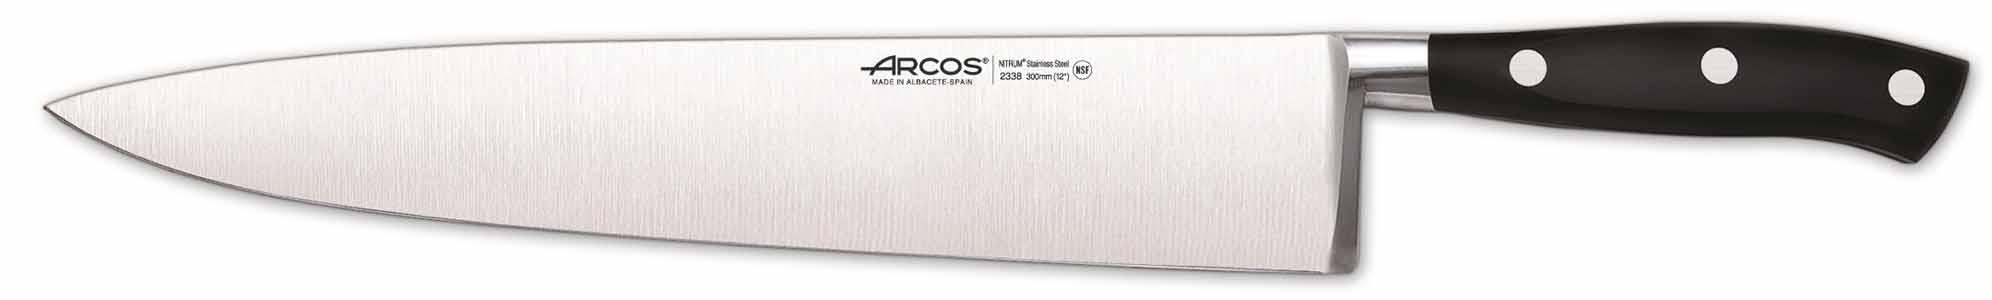 AR233800 CUCHILLO COCINERO 30CM PROF